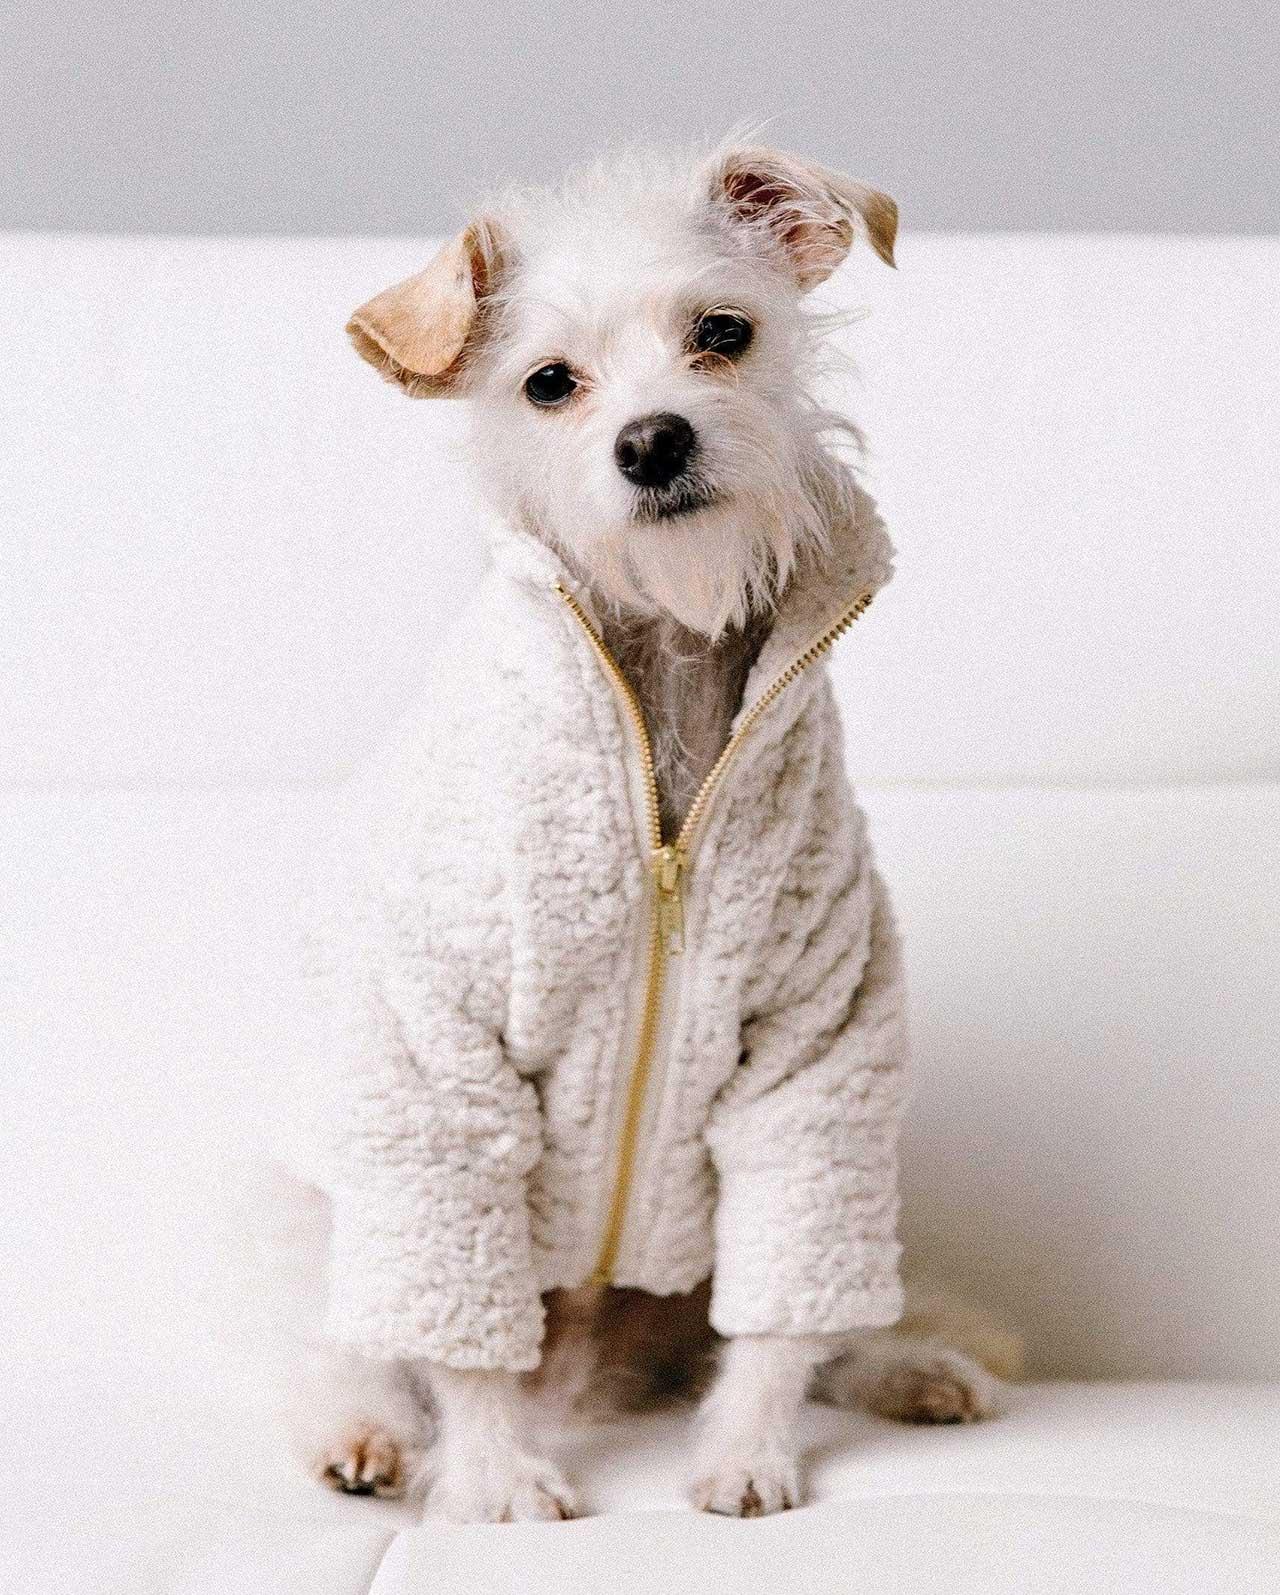 Dog Threads' Swiss Teddy Jacket